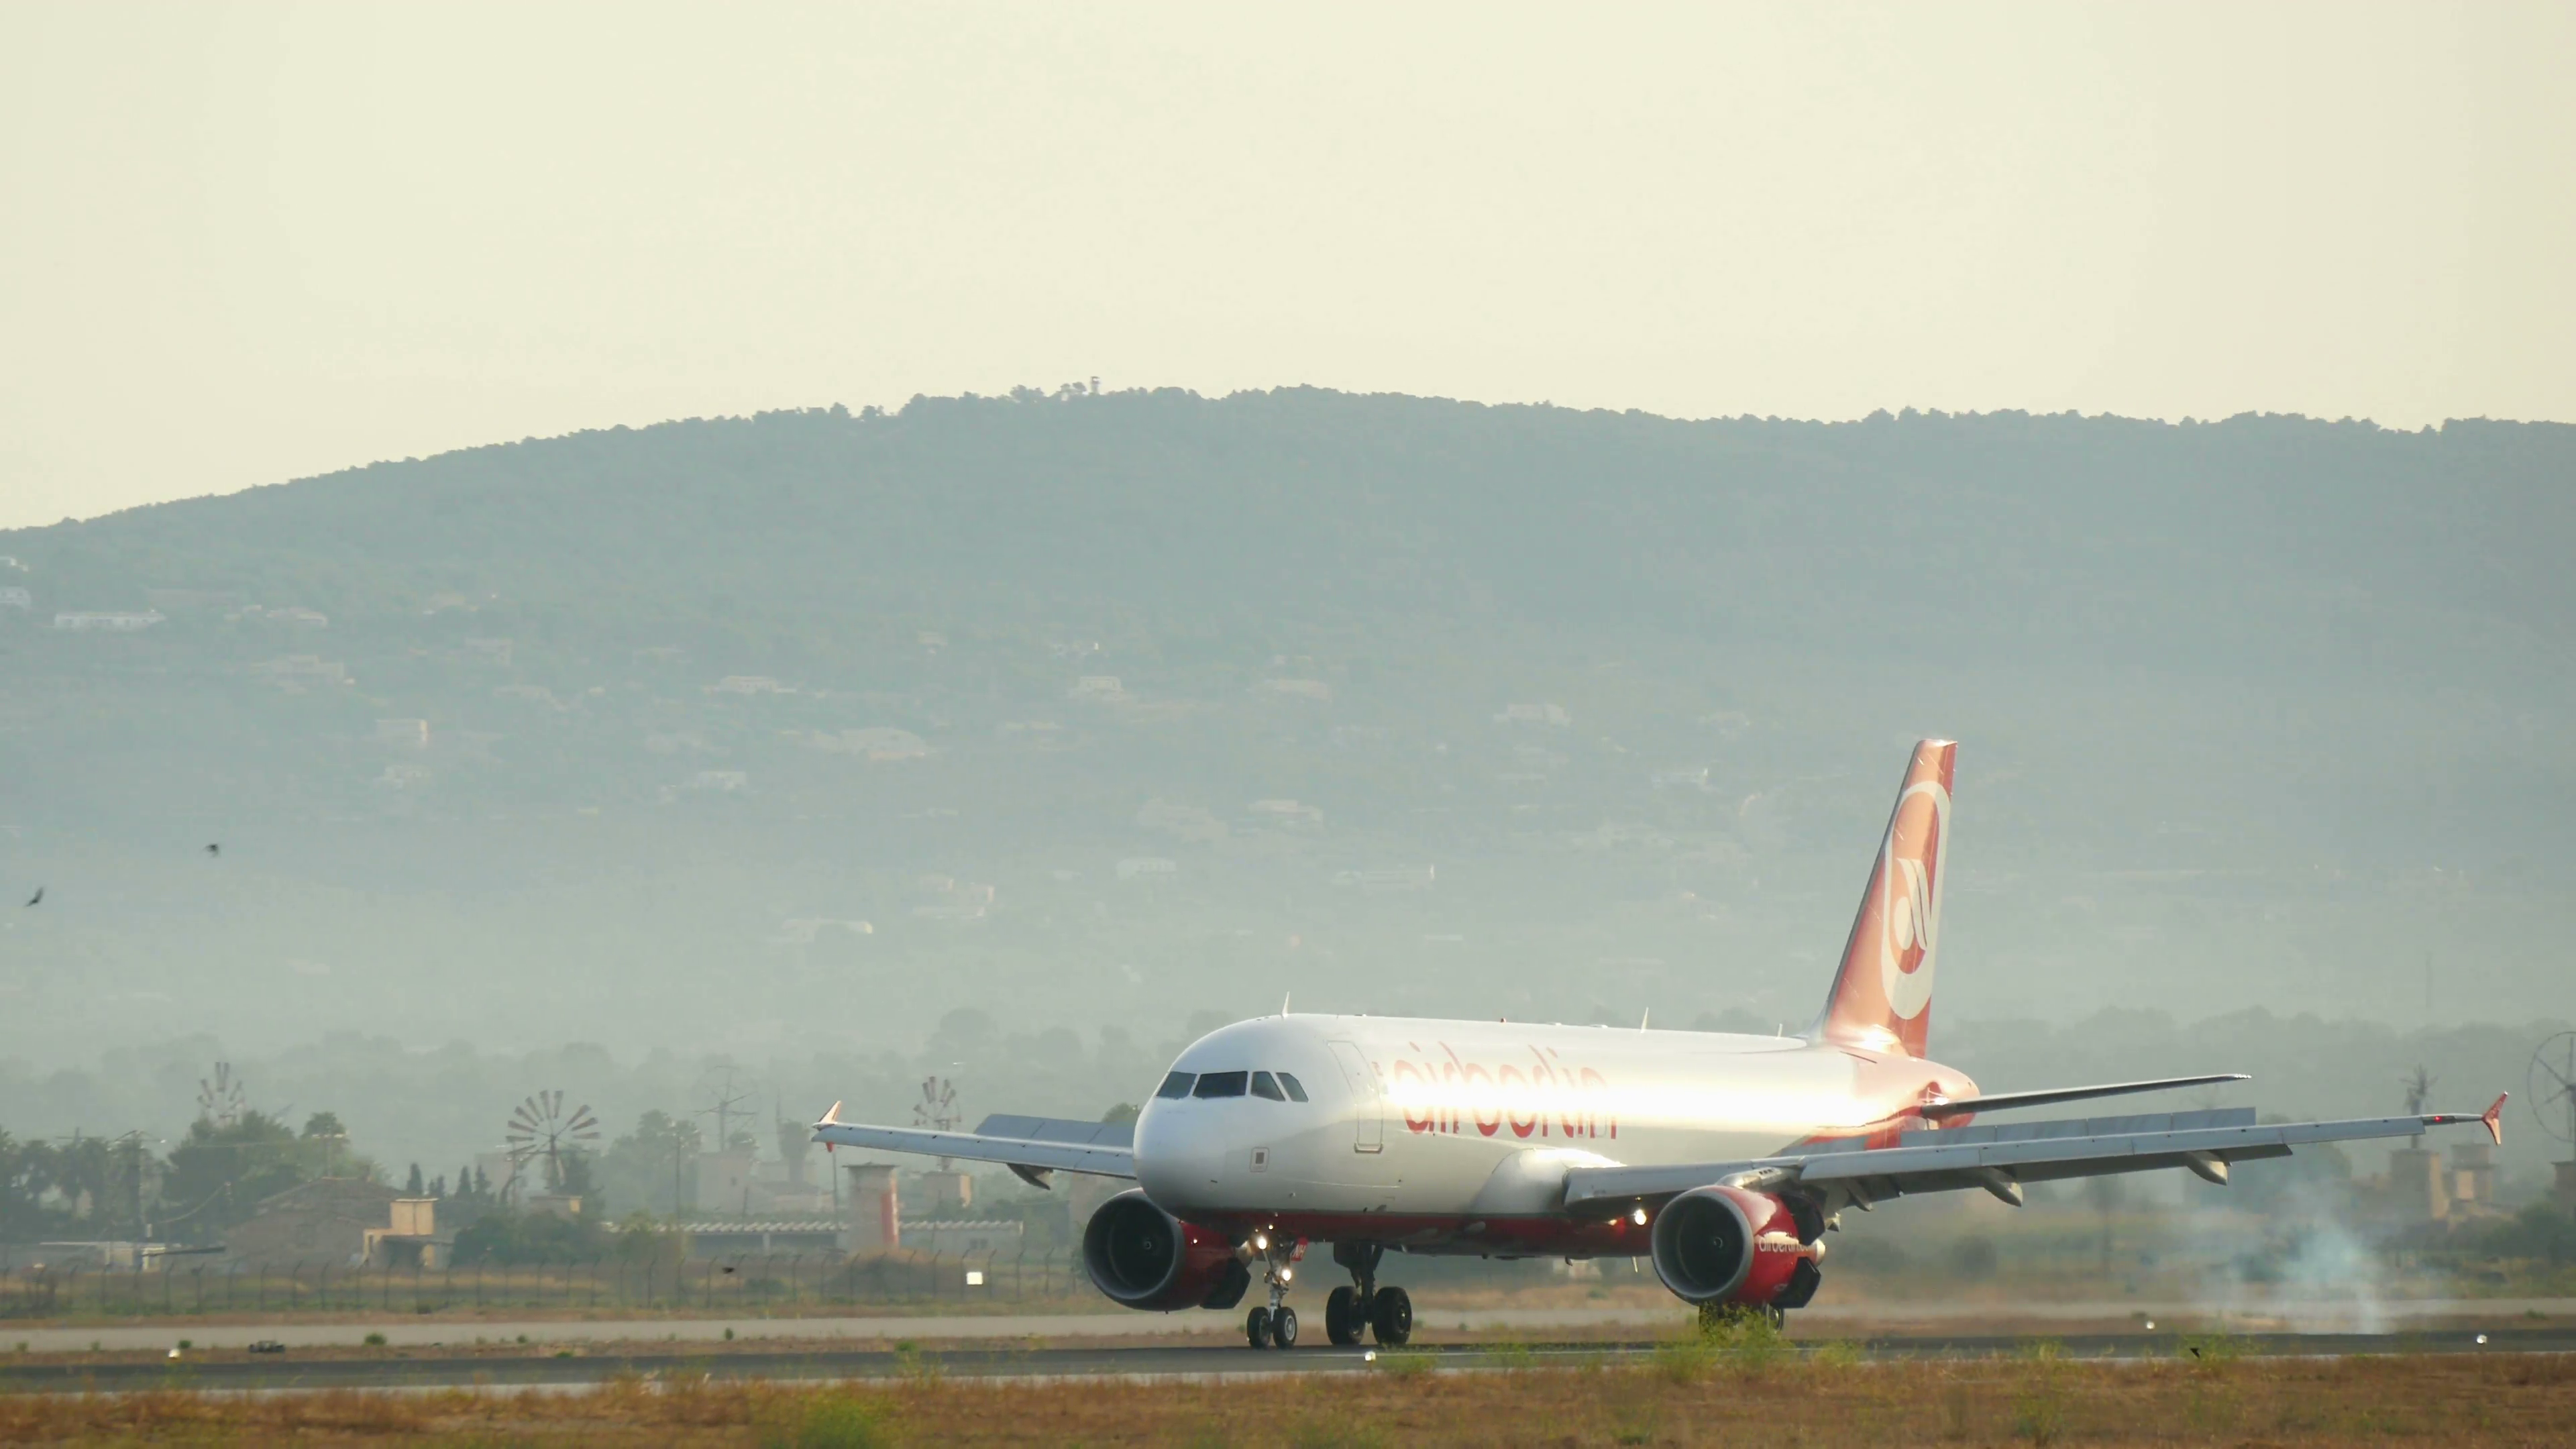 Commercial Airliner Flight Landing at Mallorca Airport Passenger ...